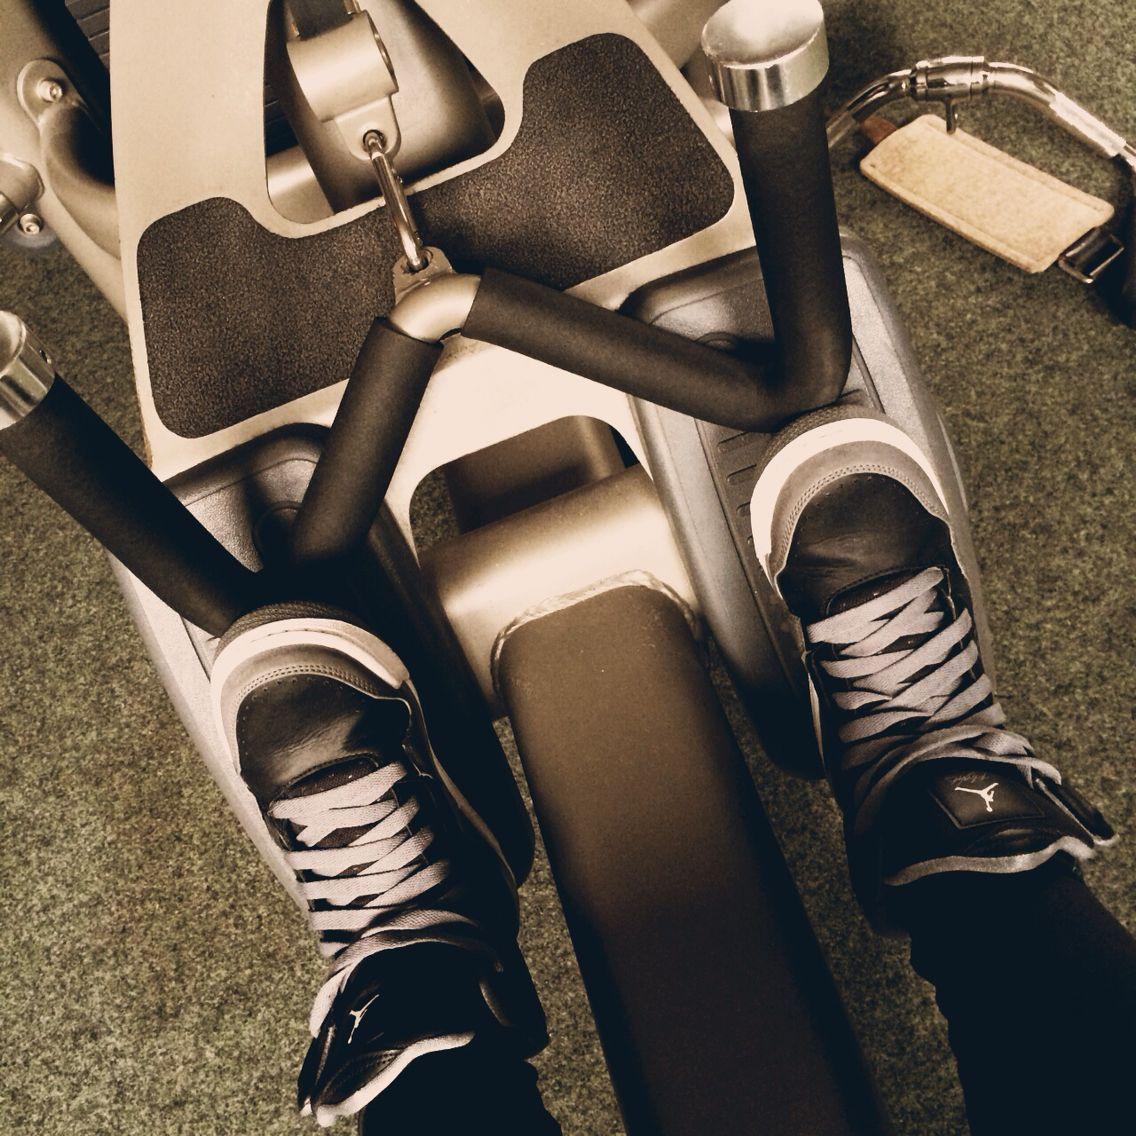 #shoes#fitness#fit#gym#getfit#sport#lifestyle#training#fun#style#love#jordans#23